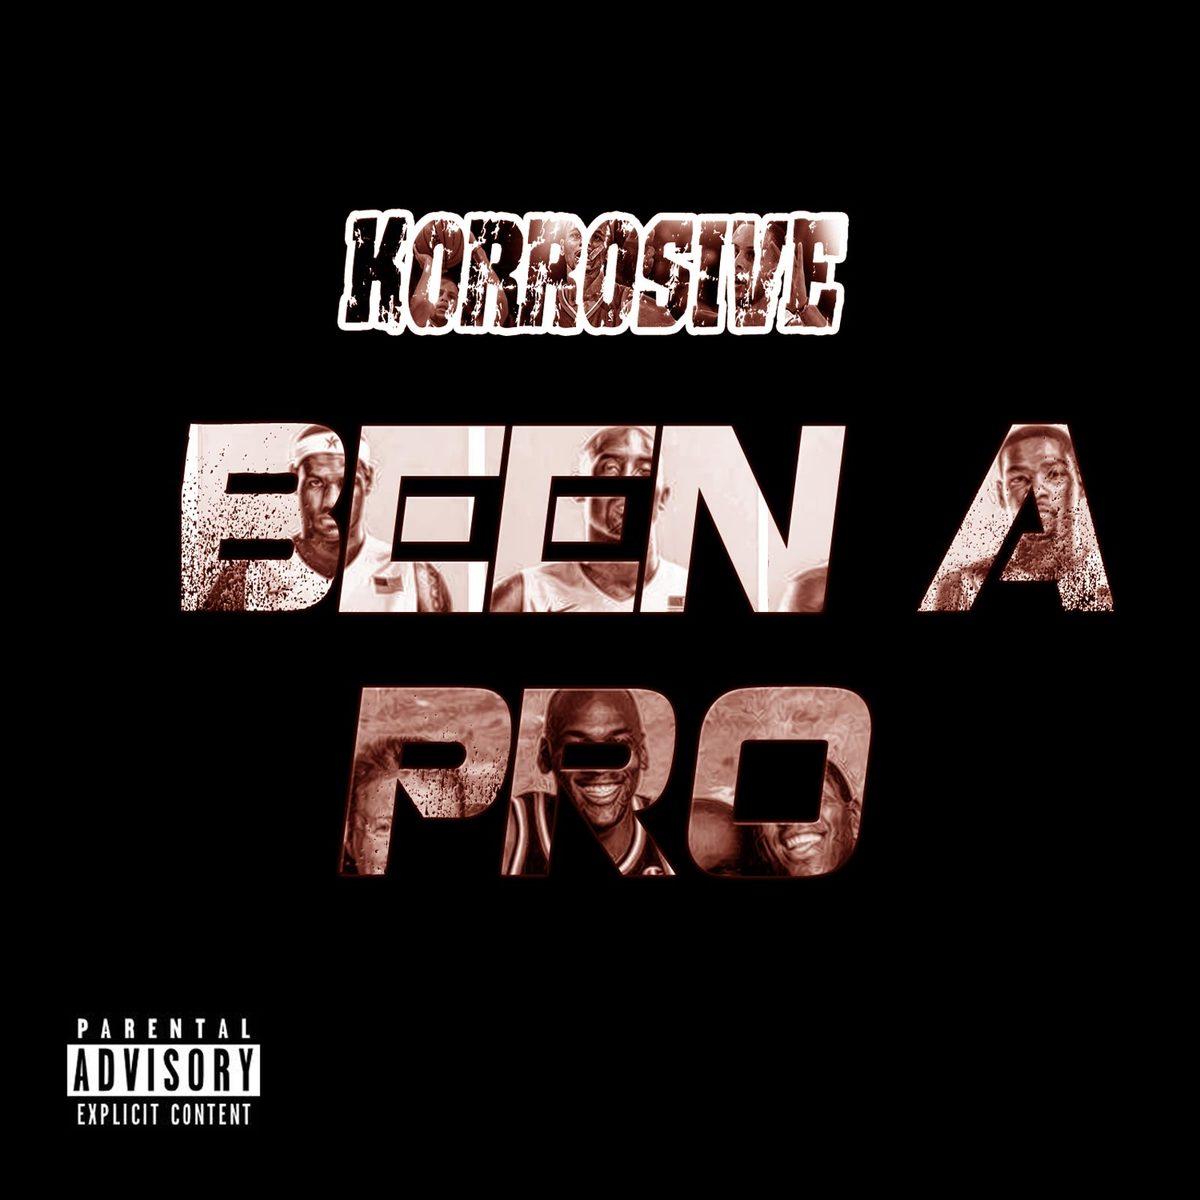 Korrosive (Been A Pro) Feat Popimp snow choppa on Pandora Radio now.